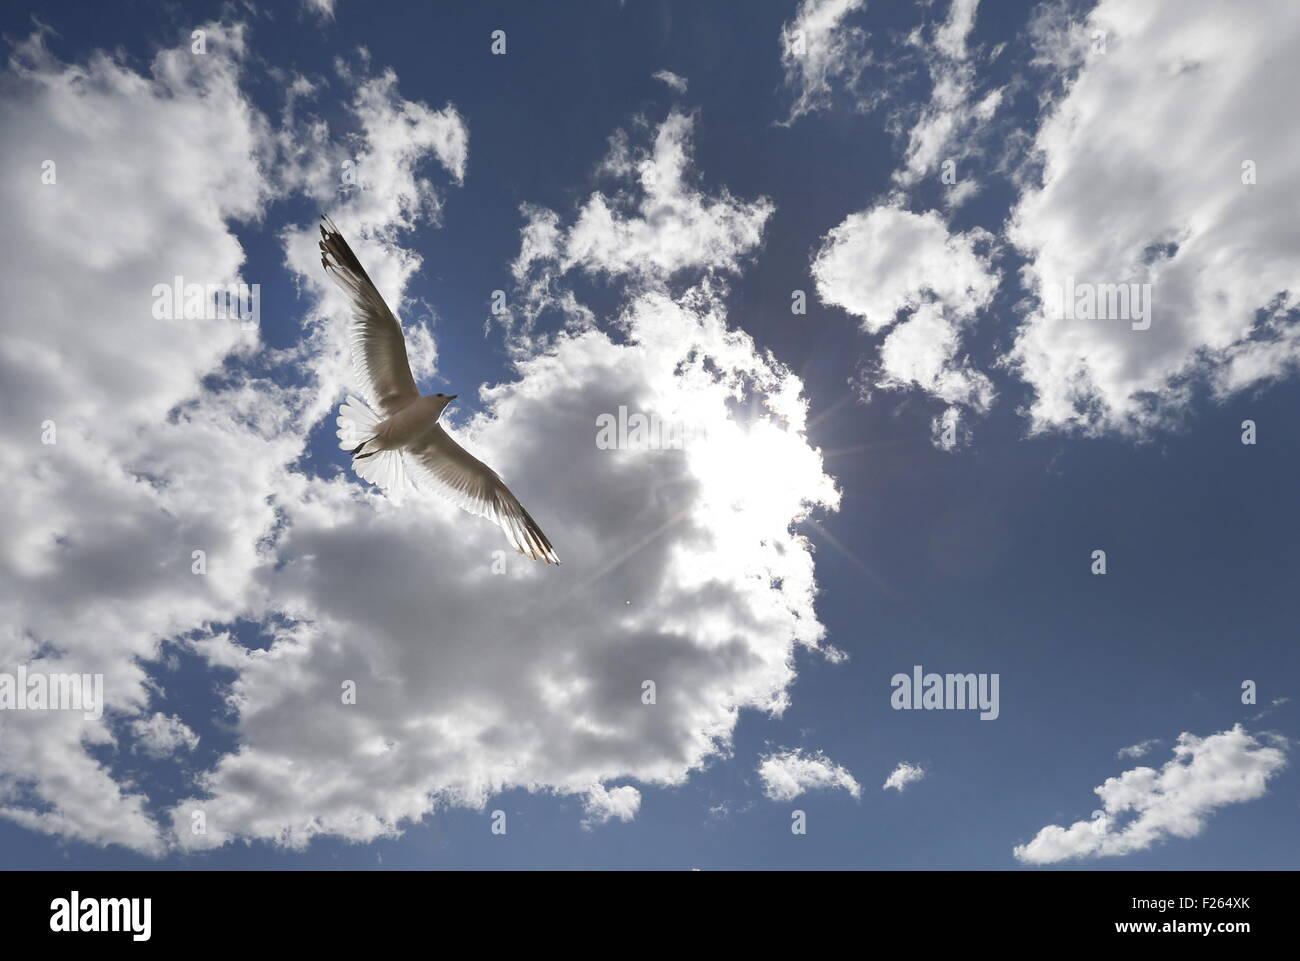 Helsinki, Finland. 1st Aug, 2015. A seagull . © Valery Matytsin/TASS/Alamy Live News - Stock Image